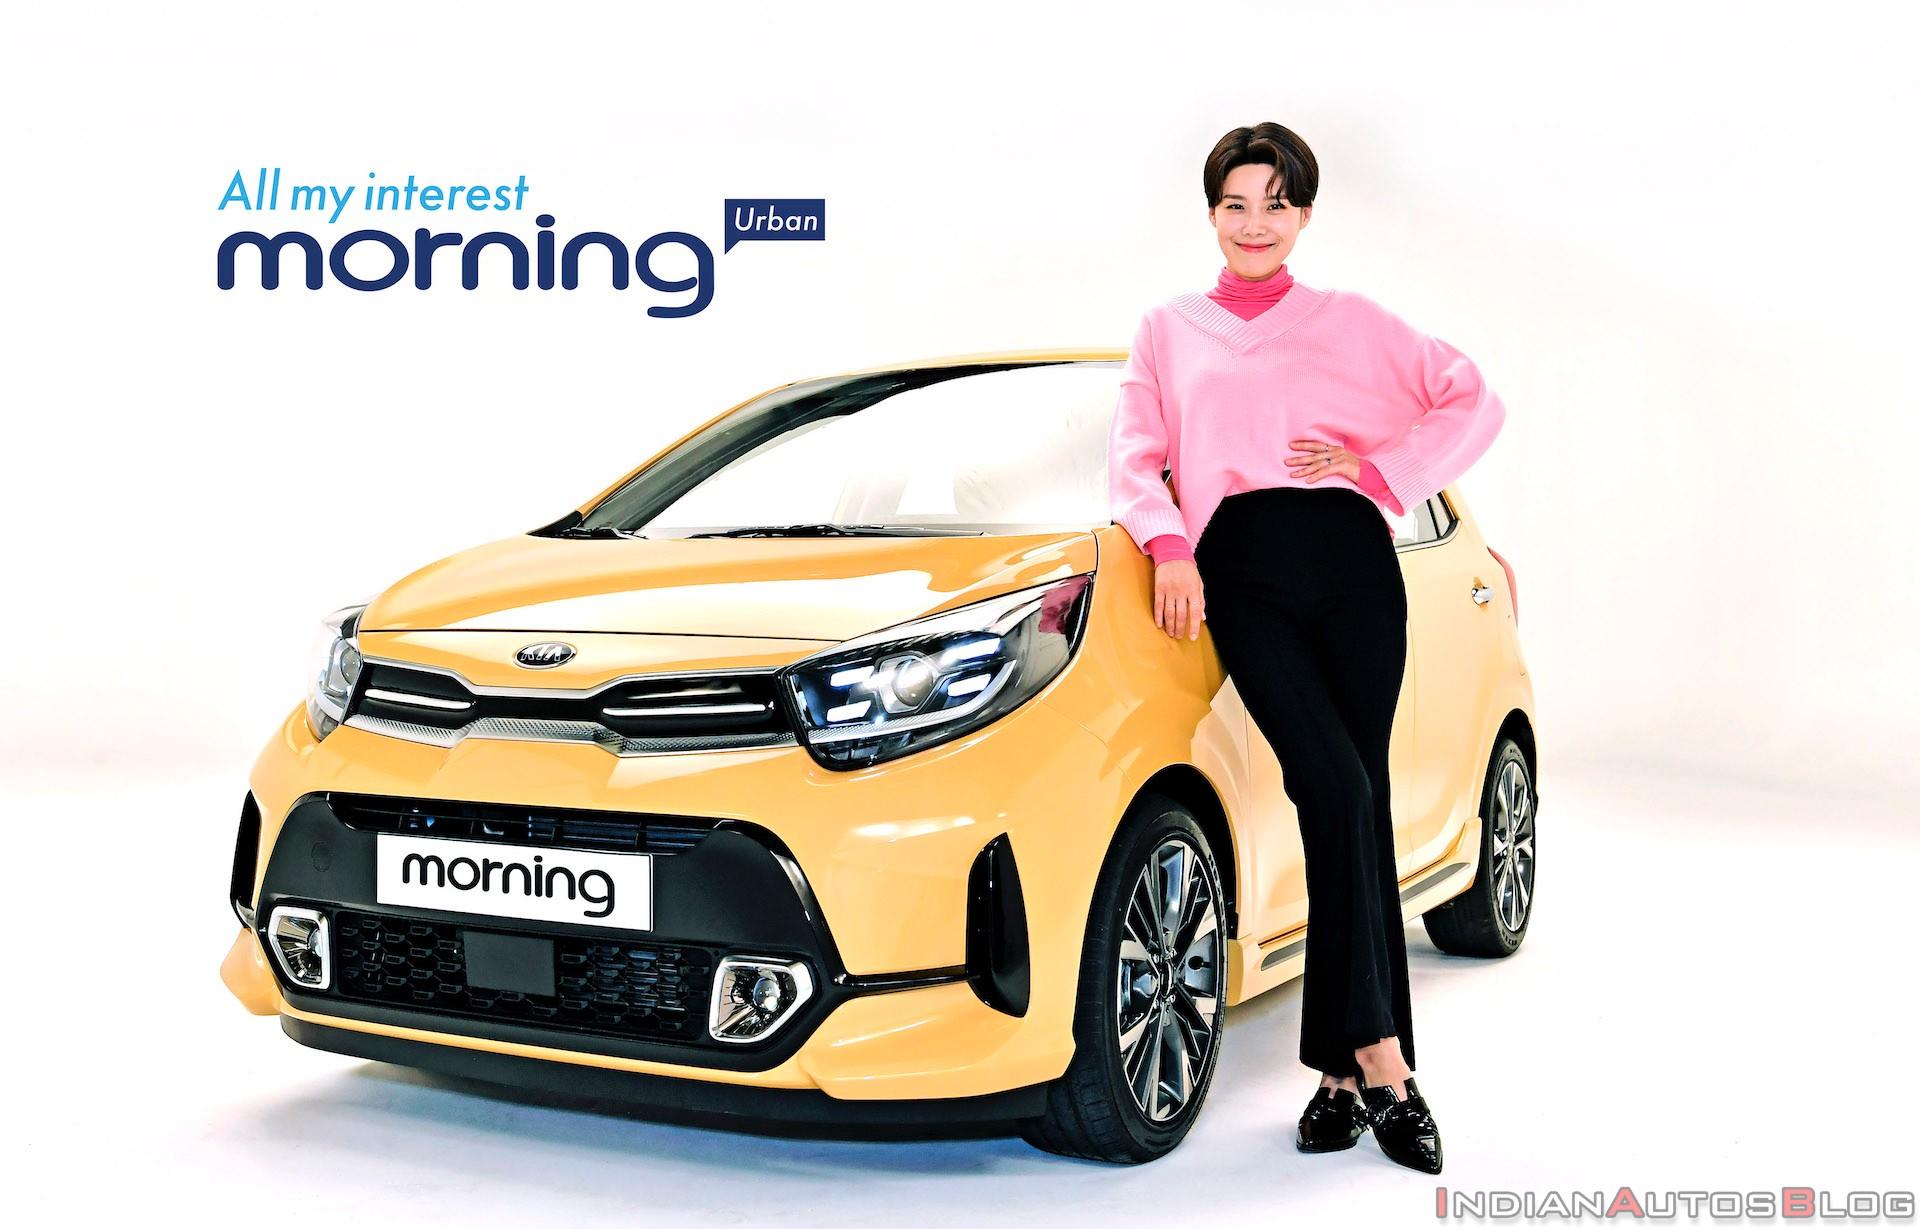 2020-kia-picanto-facelift-morning-front-quarters-7e05.jpg